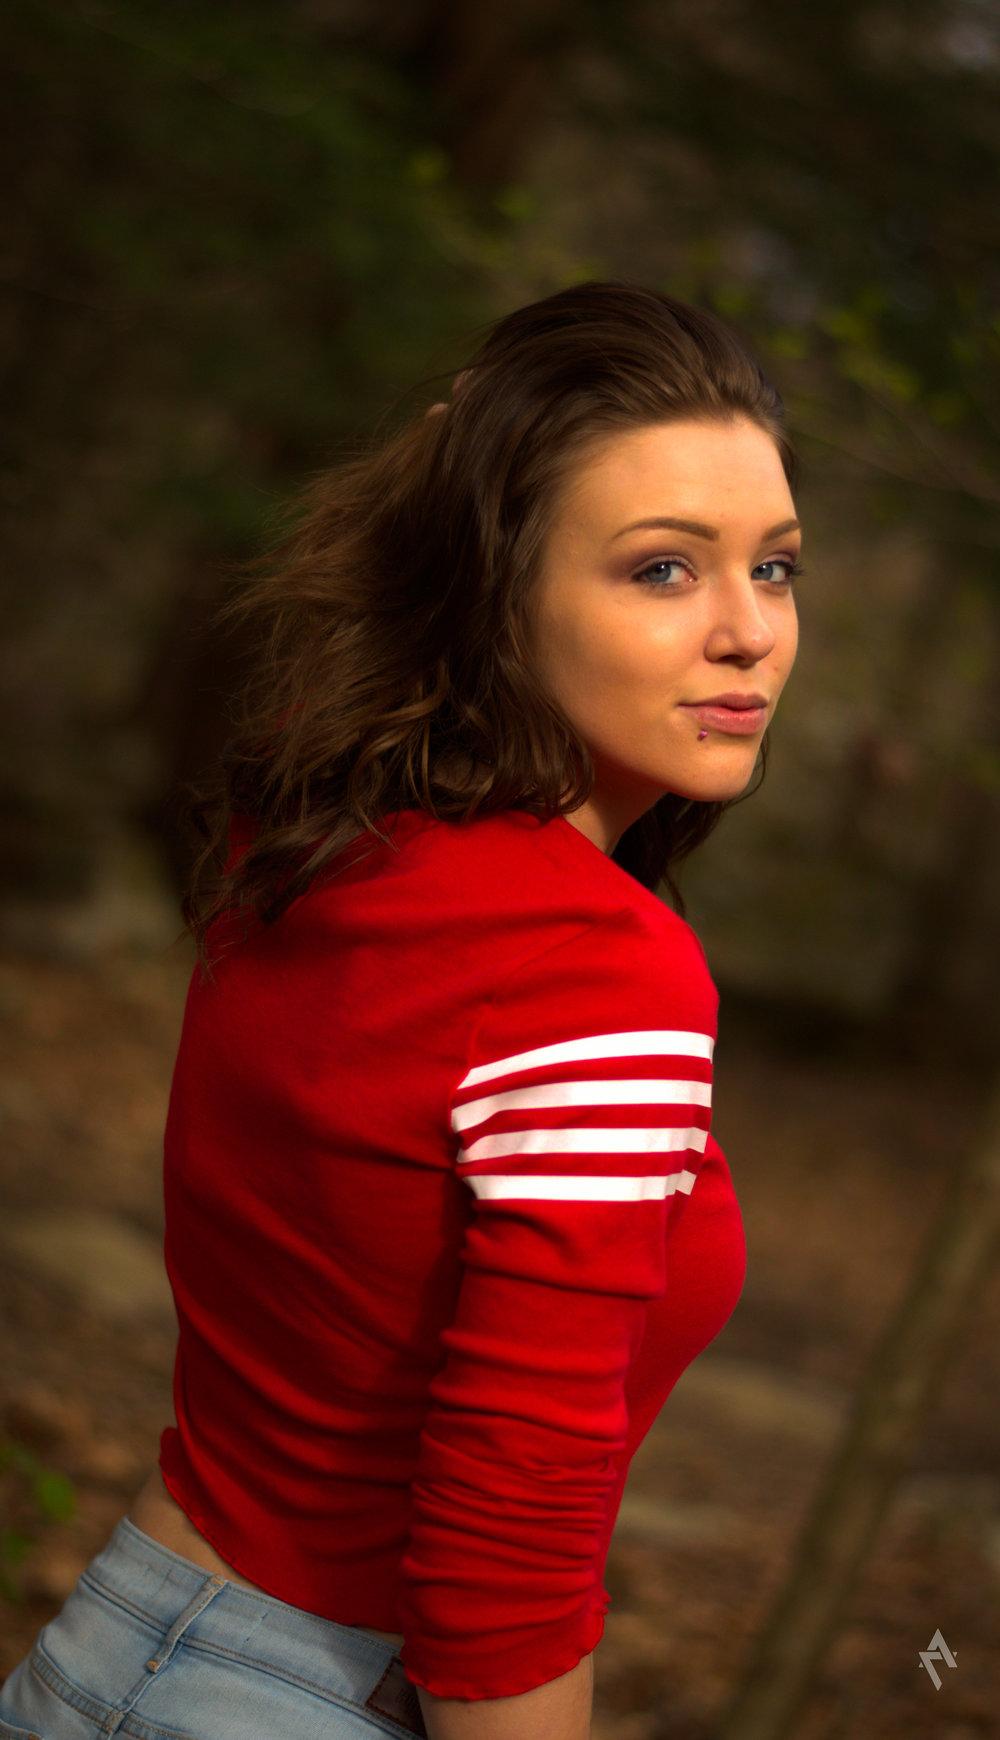 Abby_portrait_photography_ligonier_pa_warmcolors_beauty_9.jpg